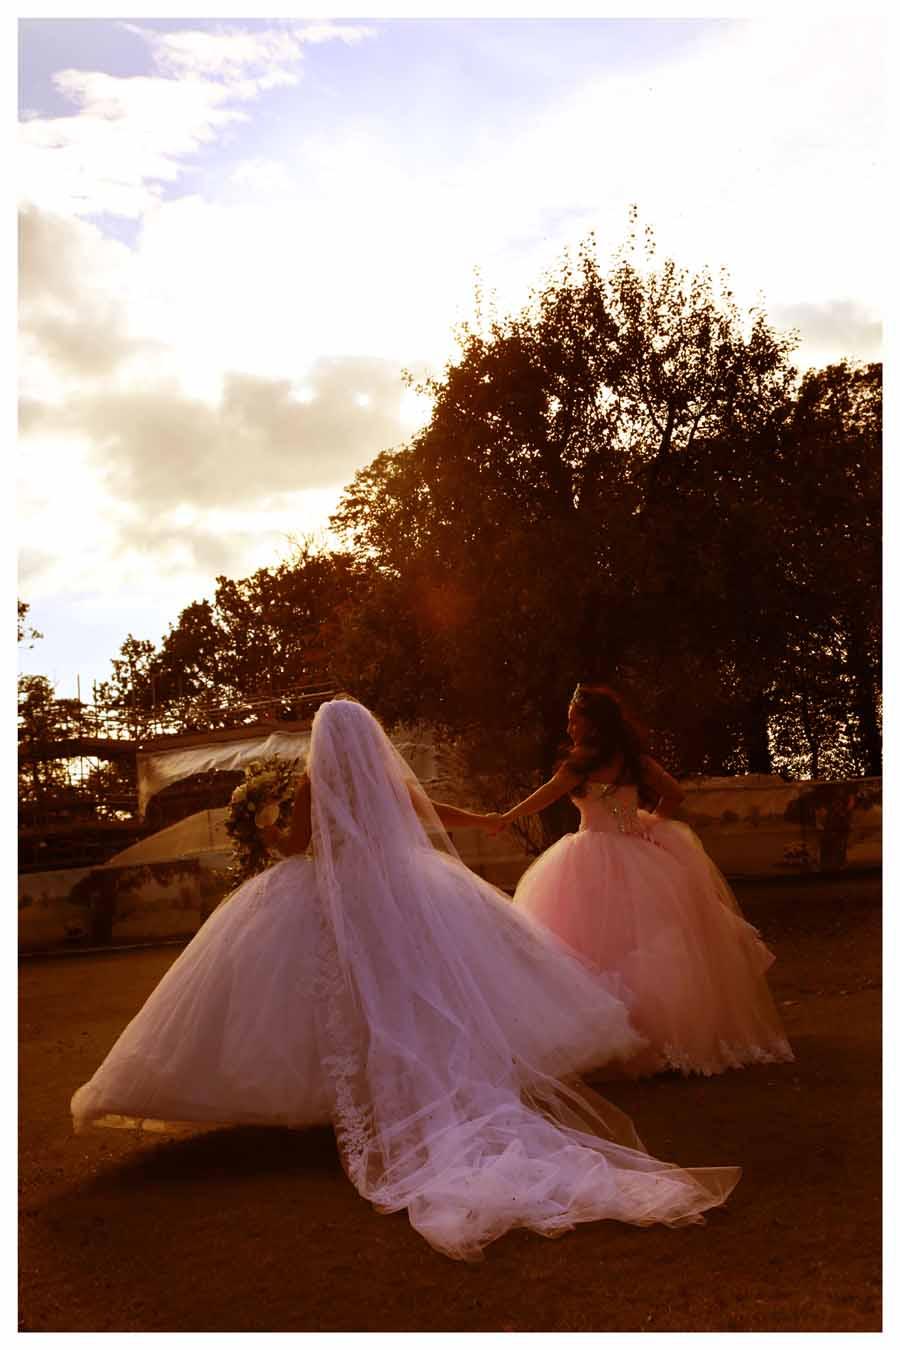 GIRLS Photos by Simeon Thaw copyright 2014 (89).jpg